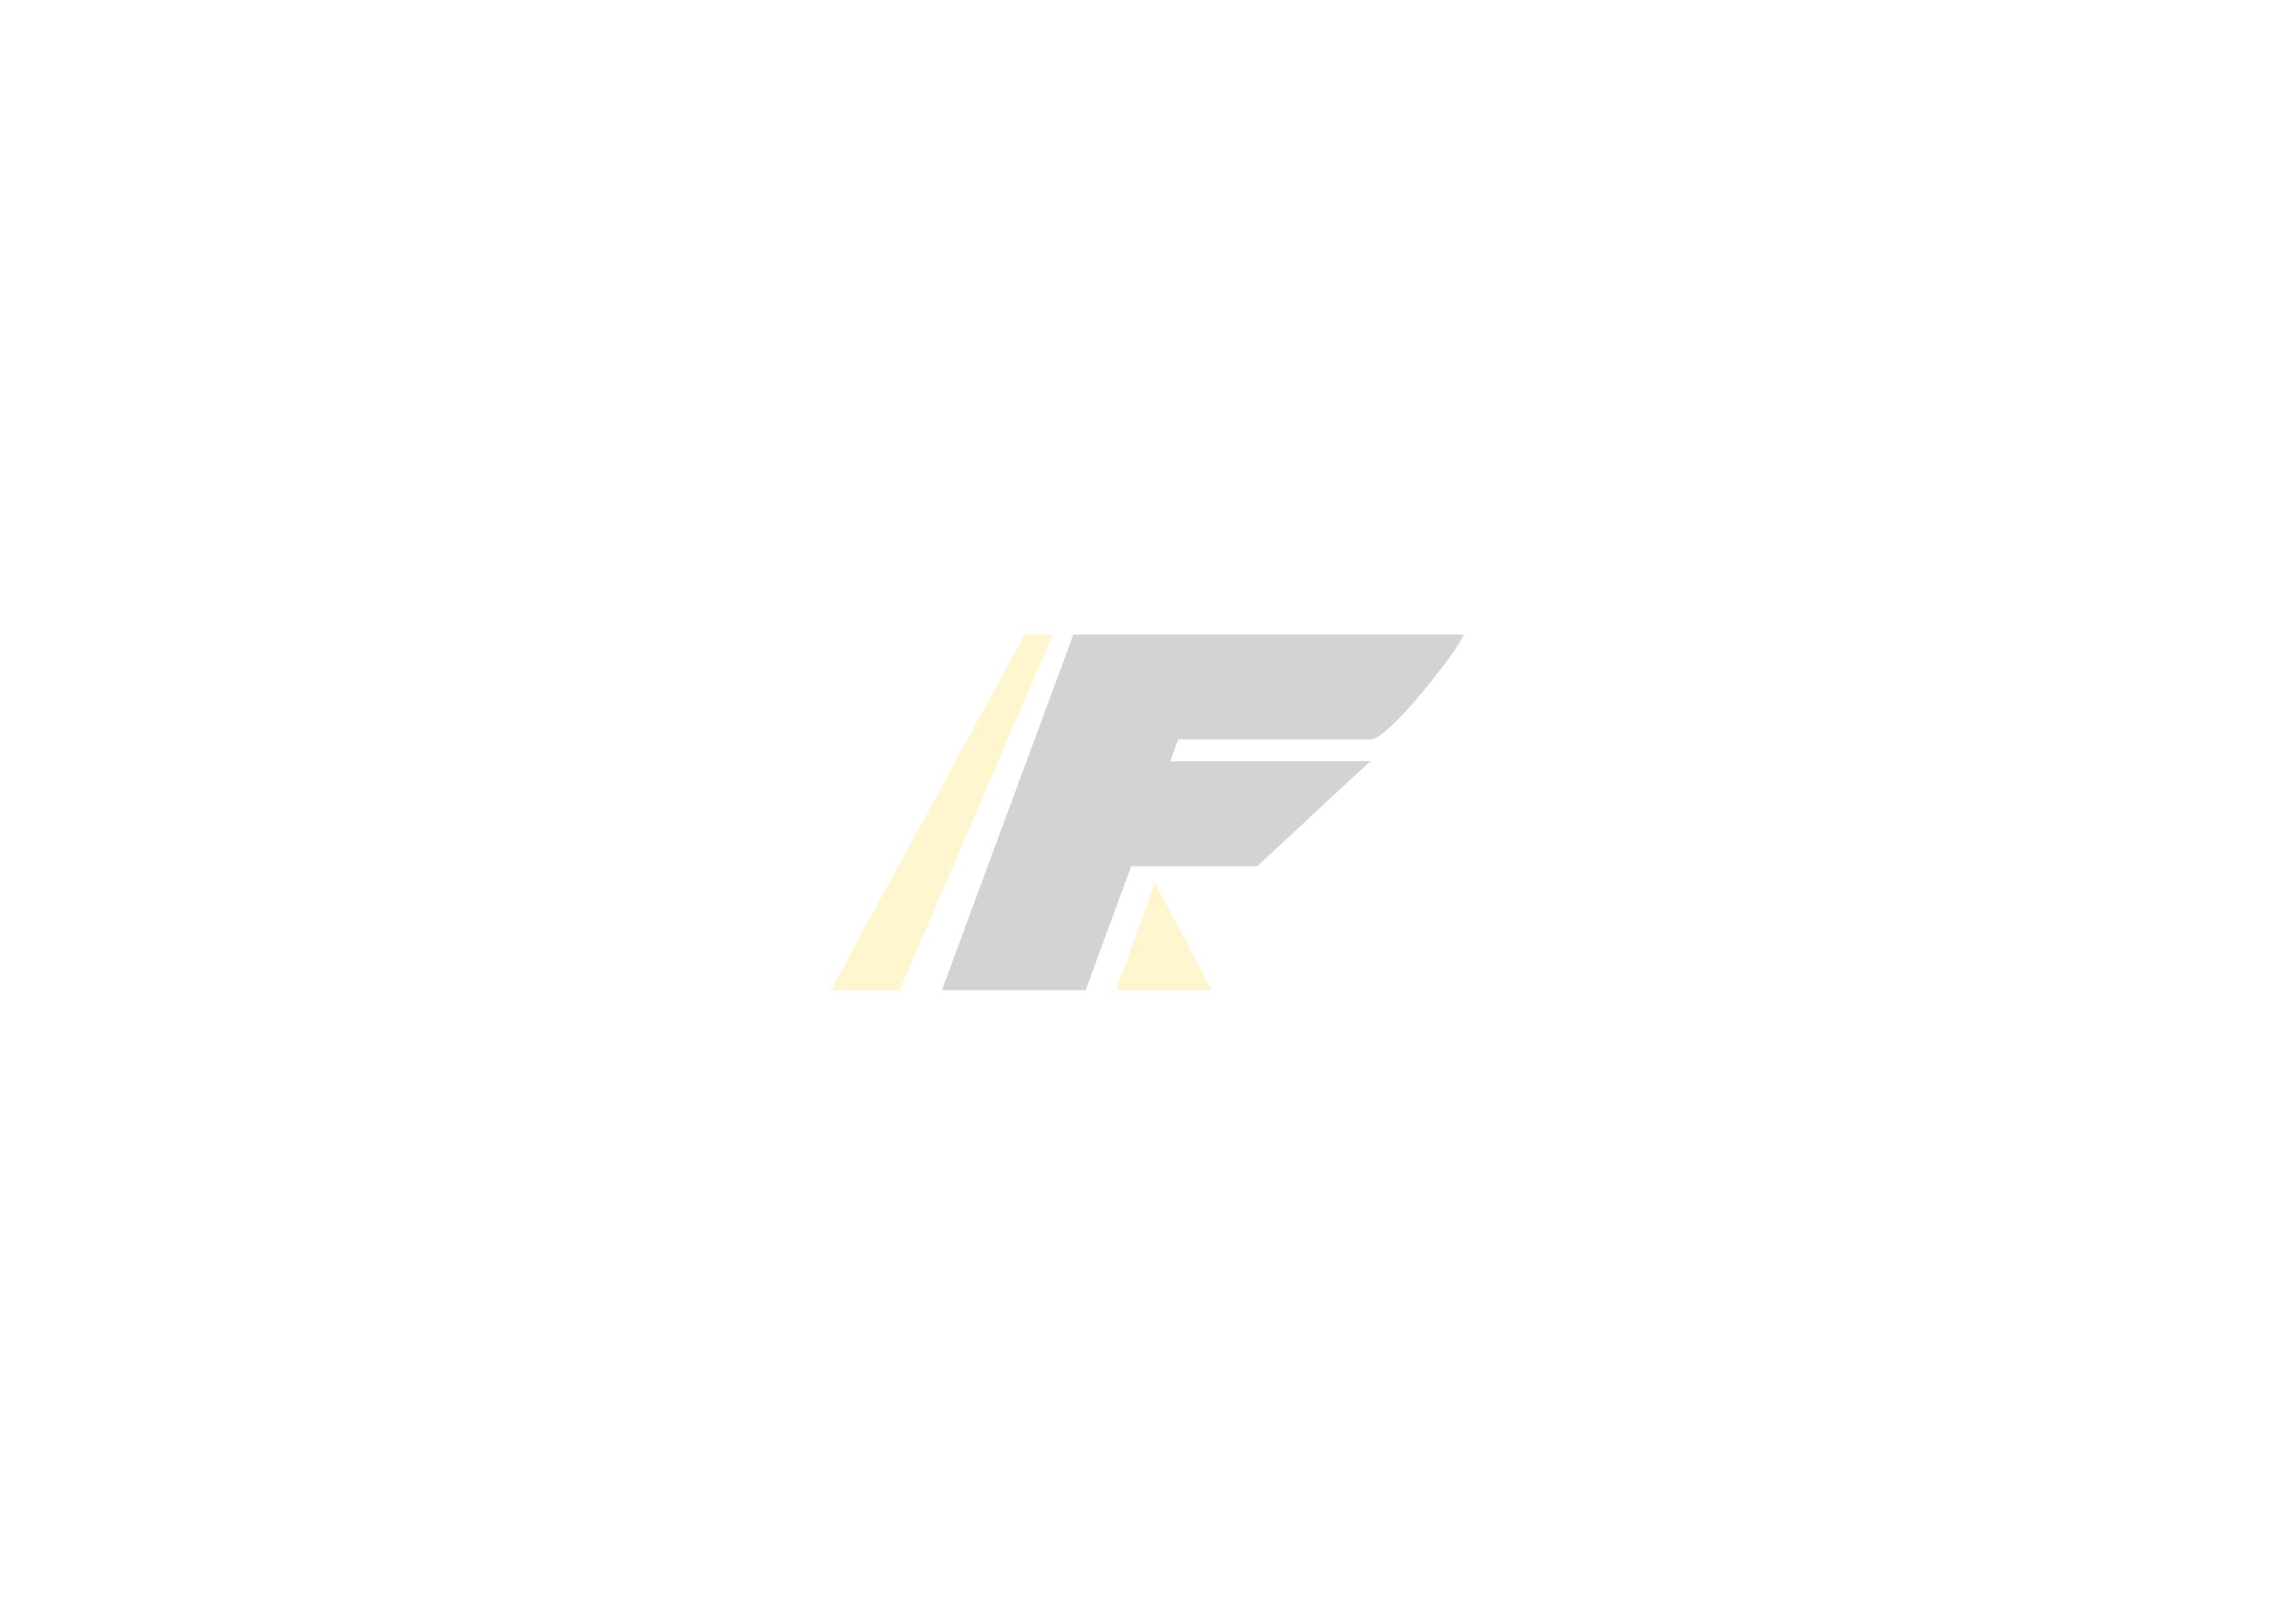 Dunlop Trialmax - Dual - Sport Road Trial